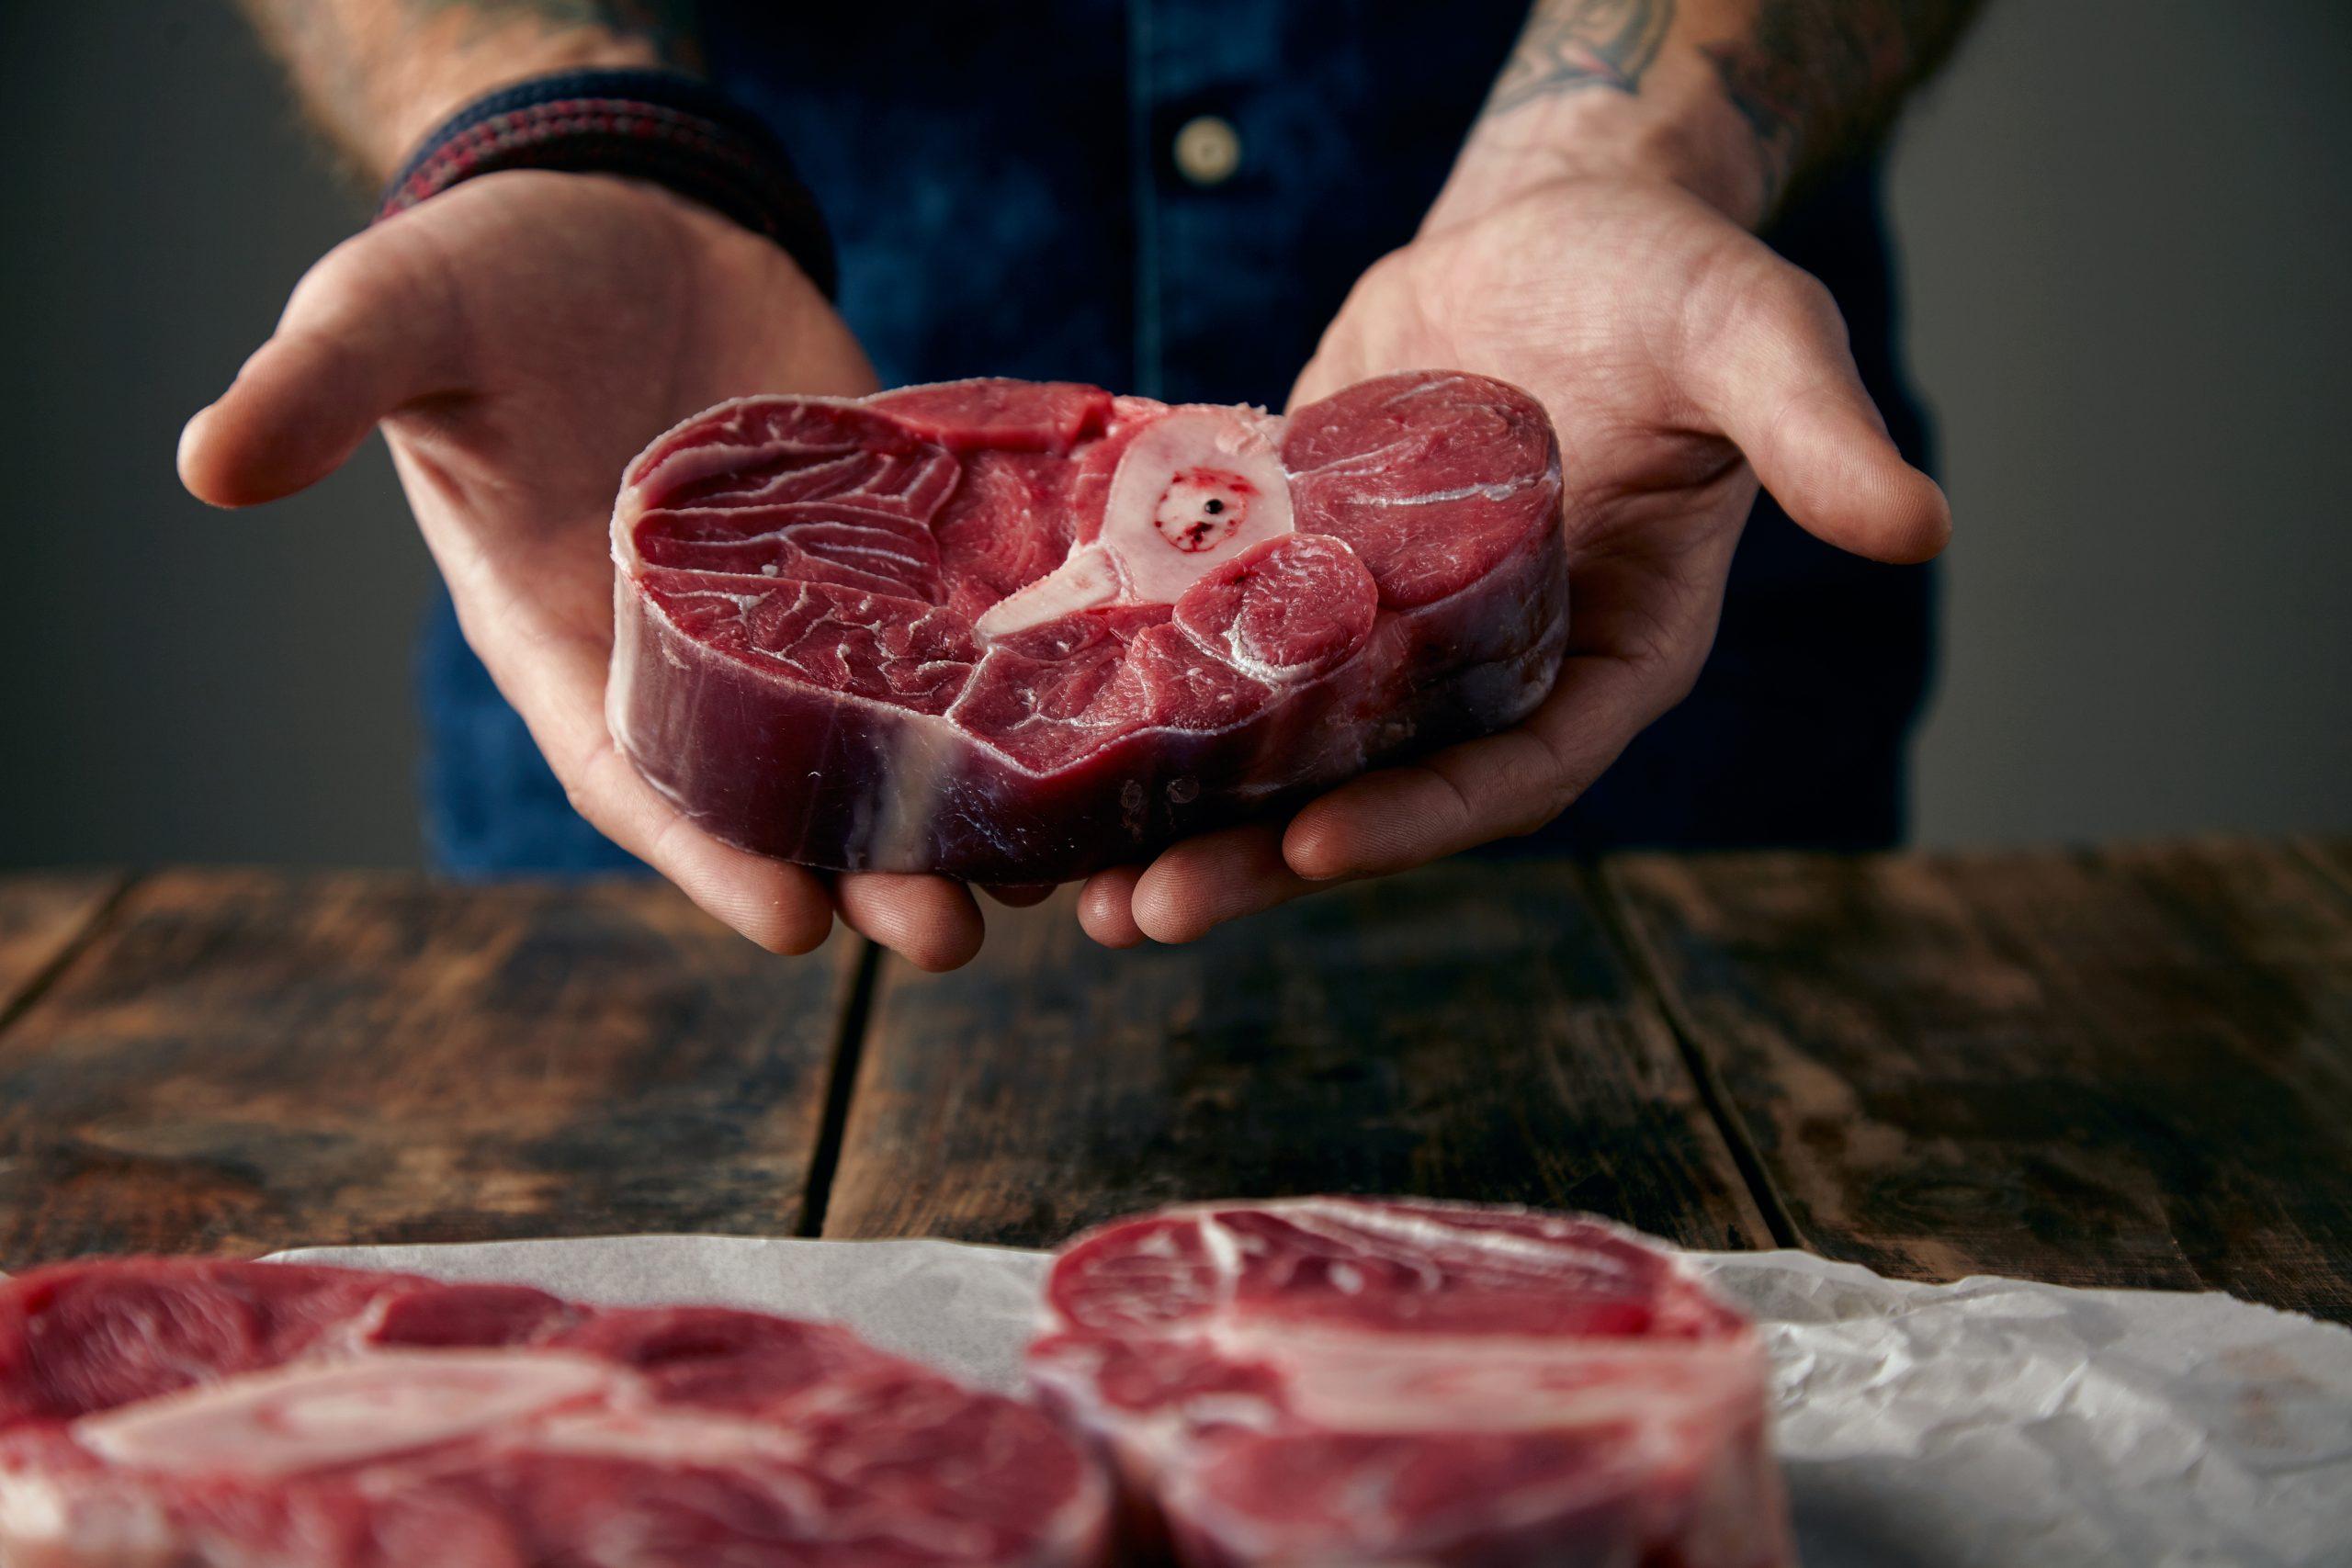 De veraneo gastronómico: platos típicos de carne en España